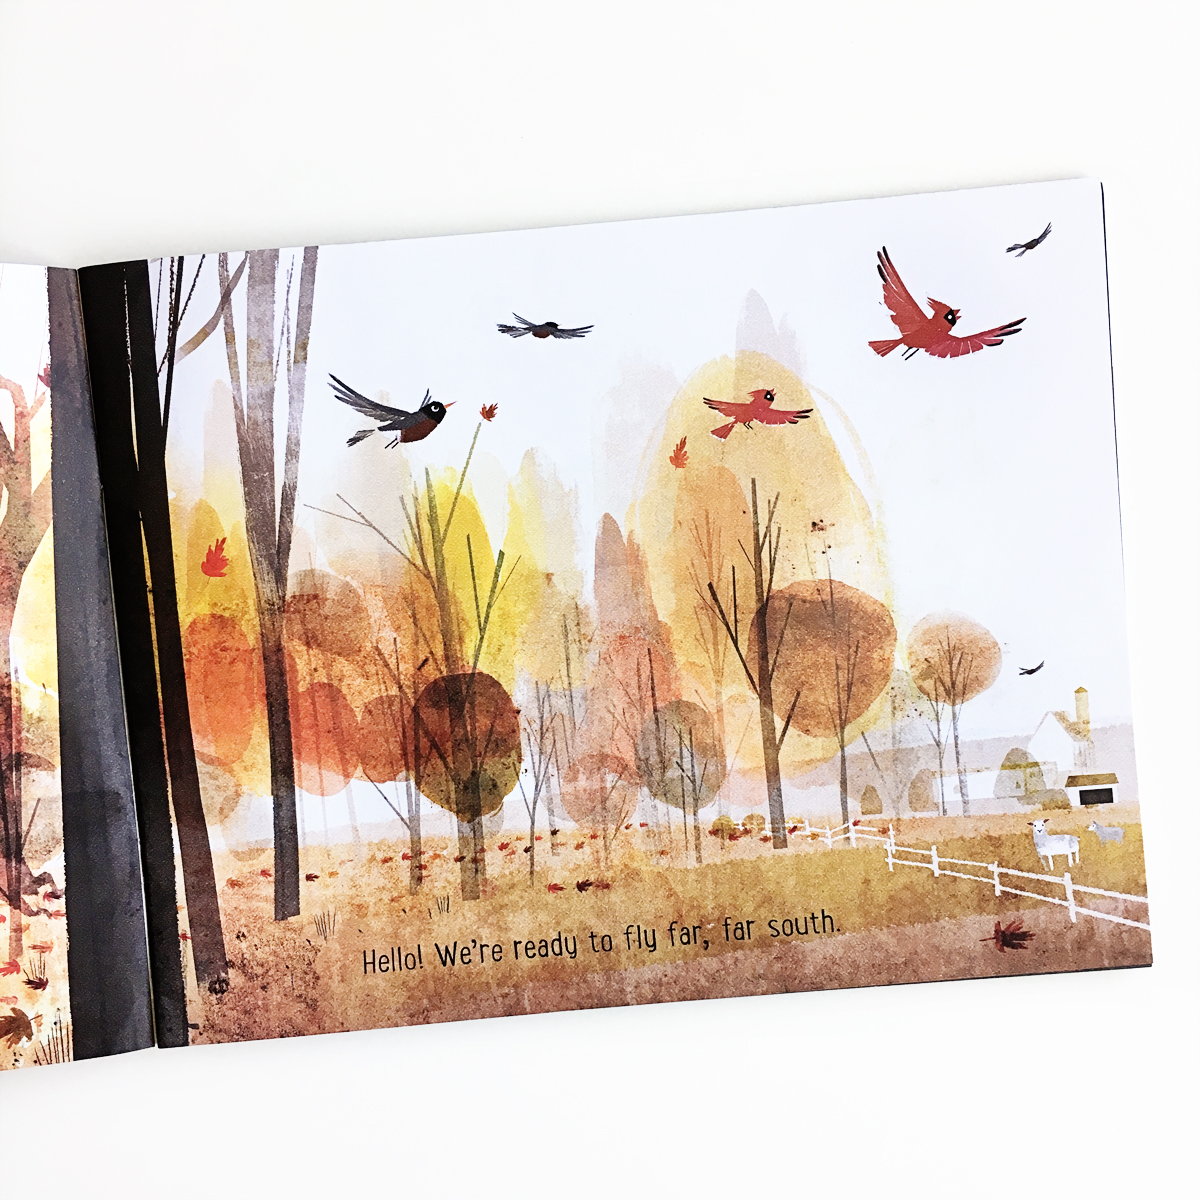 Goodbye Autumn, Hello Winter | Books For Diversity